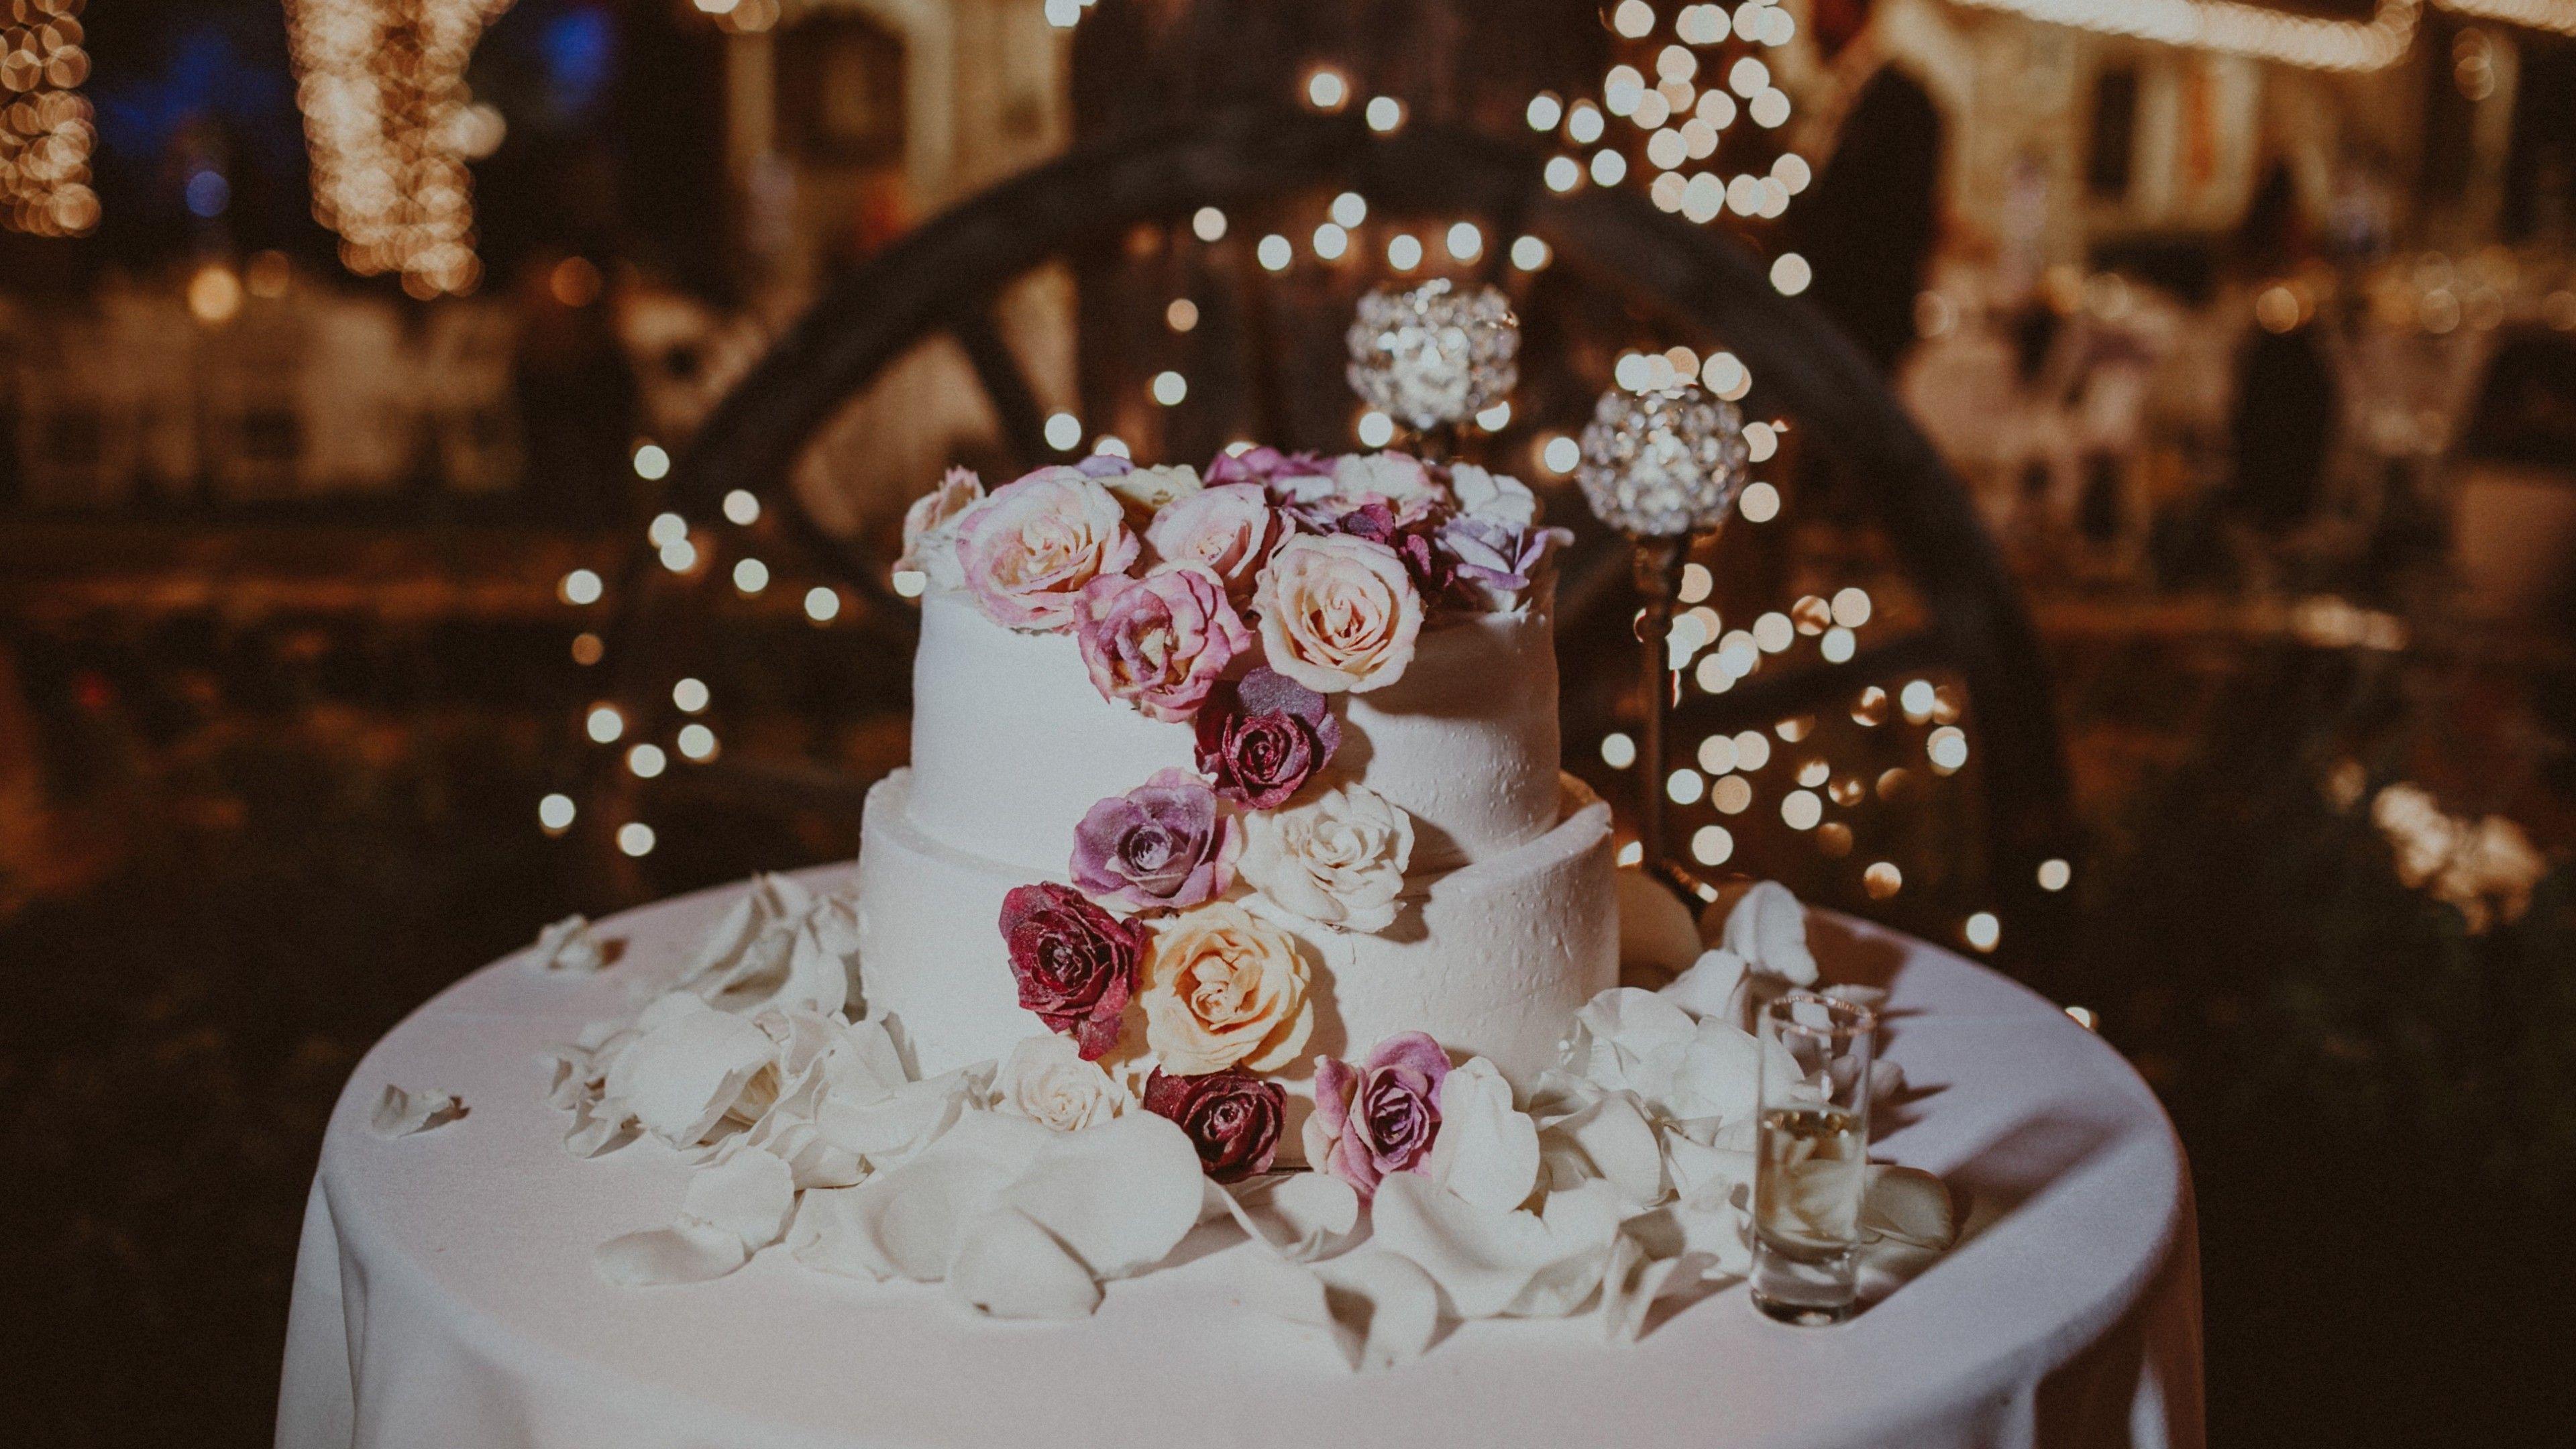 Wedding Cake Wallpapers Top Free Wedding Cake Backgrounds Wallpaperaccess